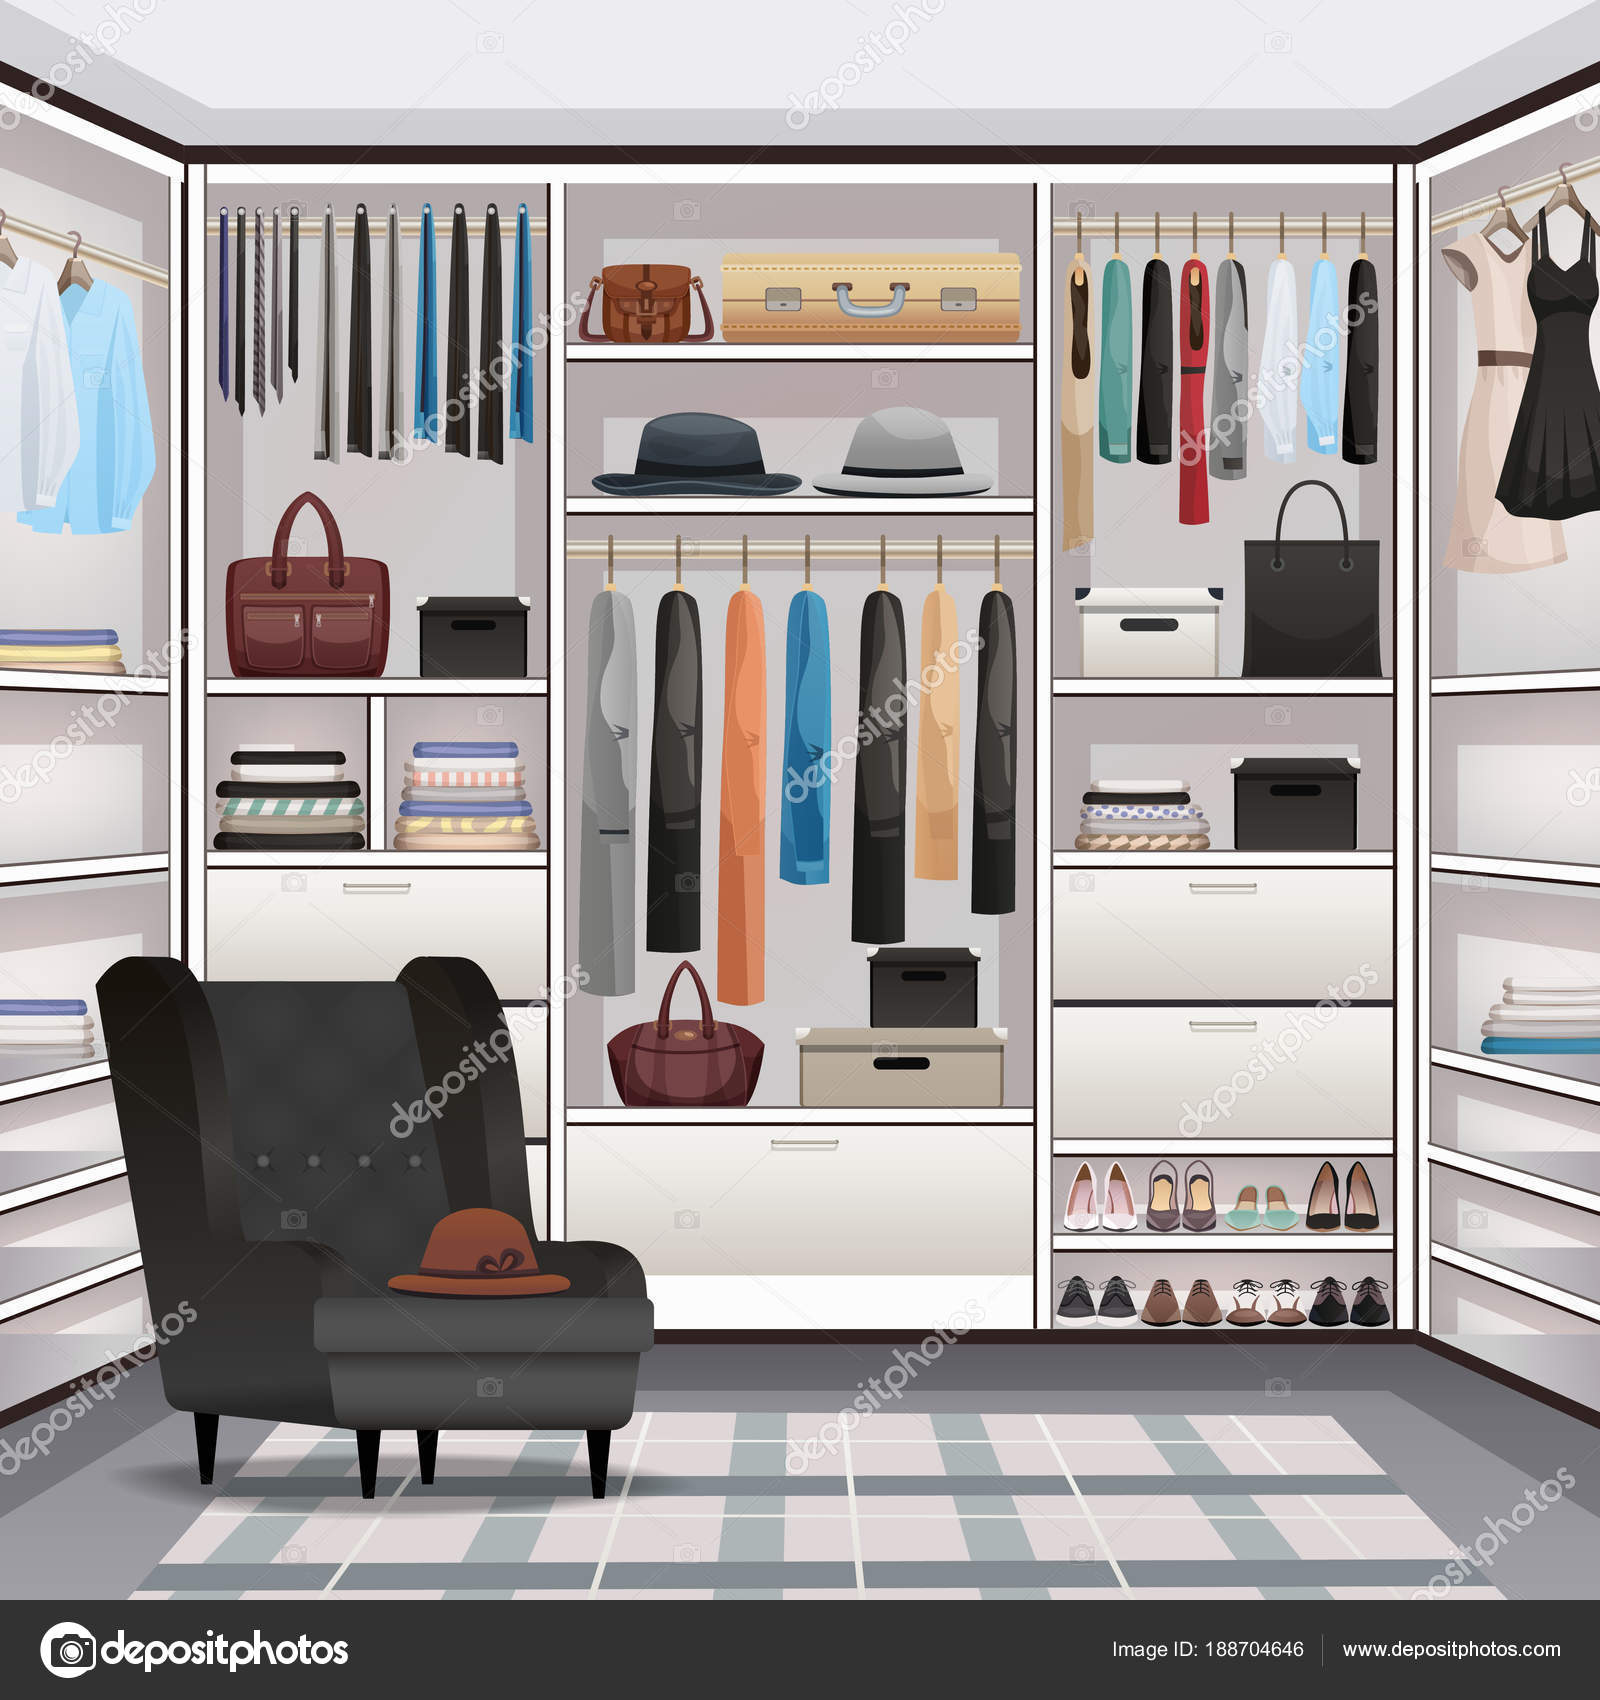 kledingkast garderobe interieur realistisch stockvector